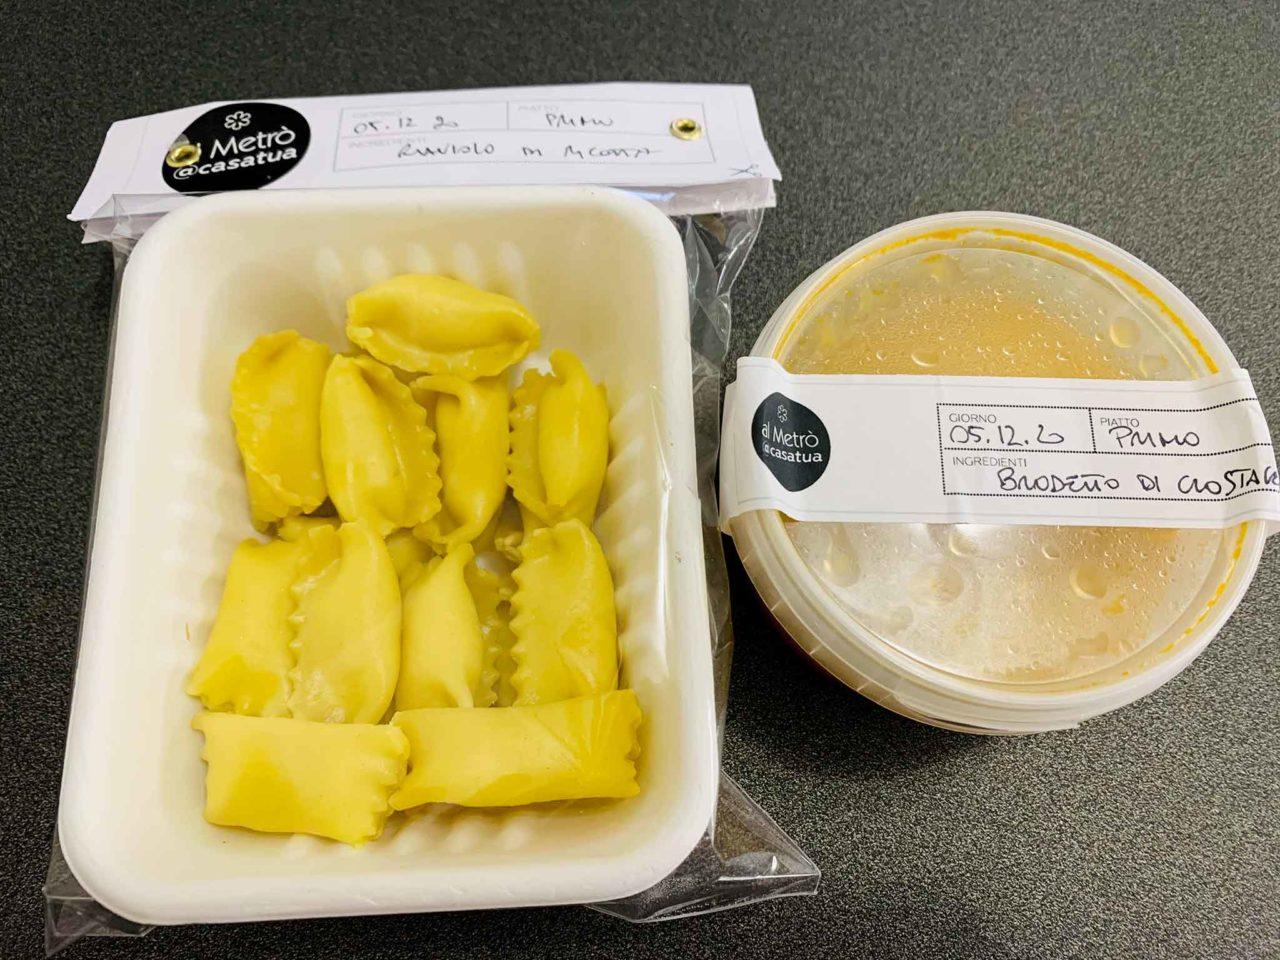 Al Metro ristorante San Salvo delivery ravioli